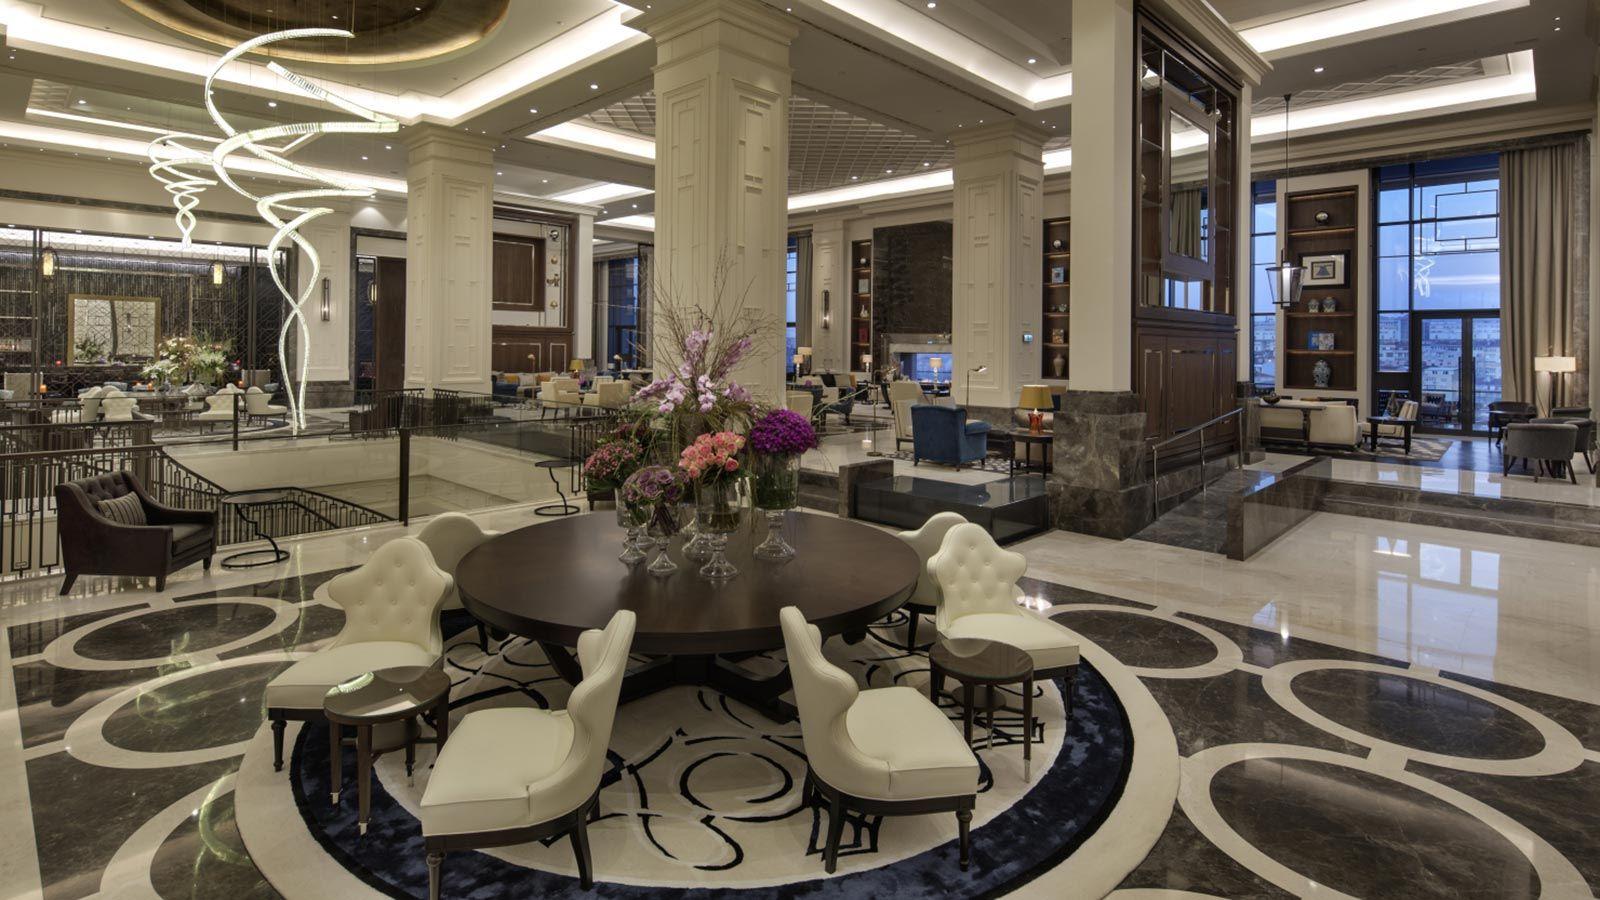 Inside Hilton's Hotel Reception Lobby Area - Mace Group